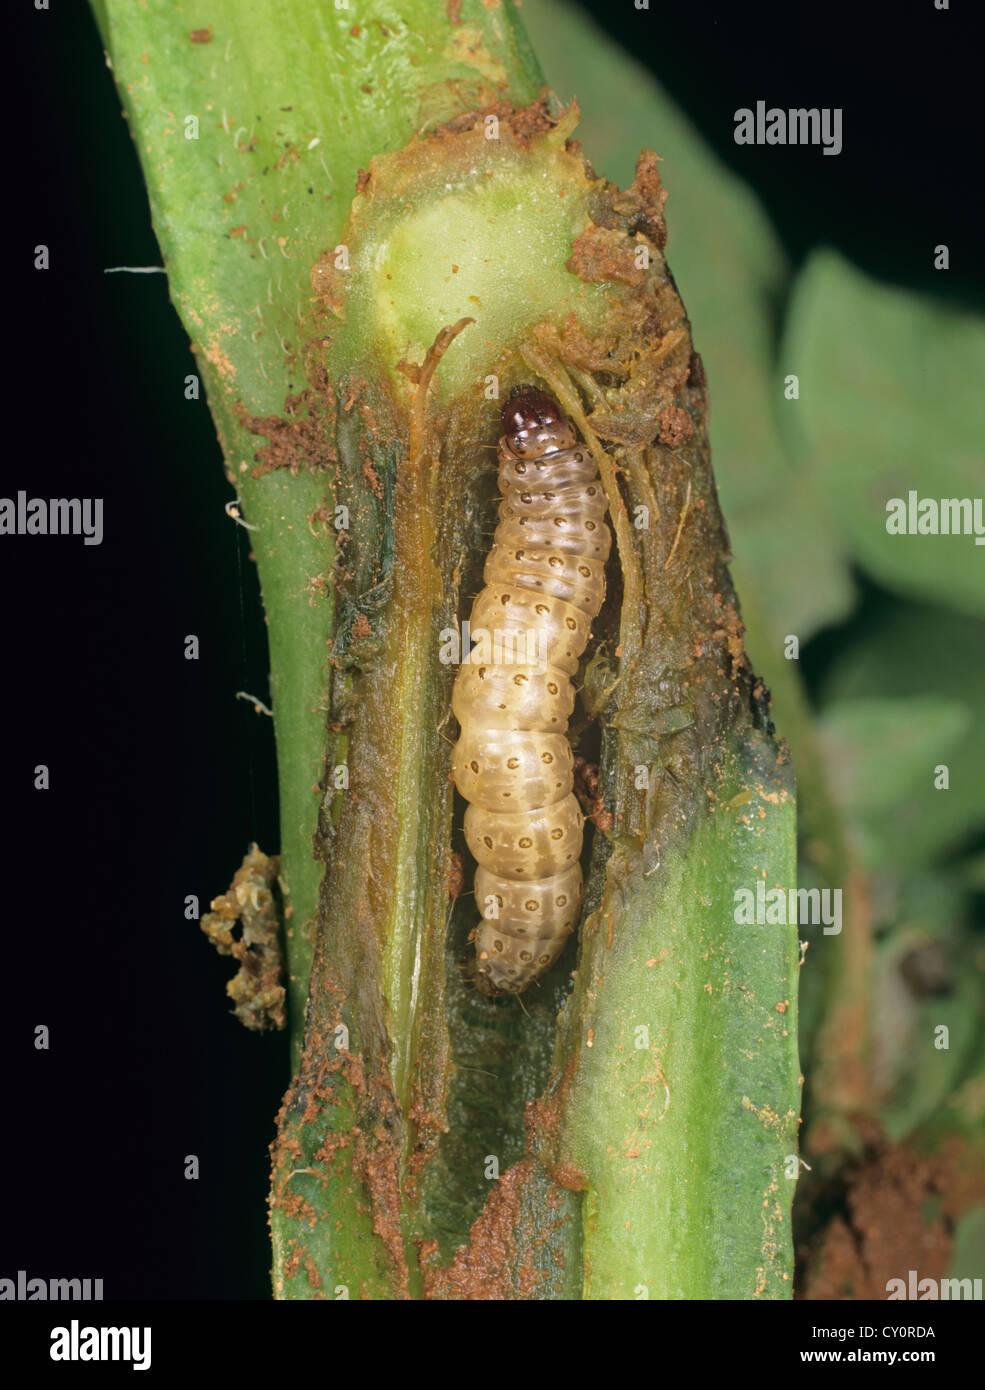 European corn borer, Ostrinia nubialis, caterpillar in damaged potato stem - Stock Image